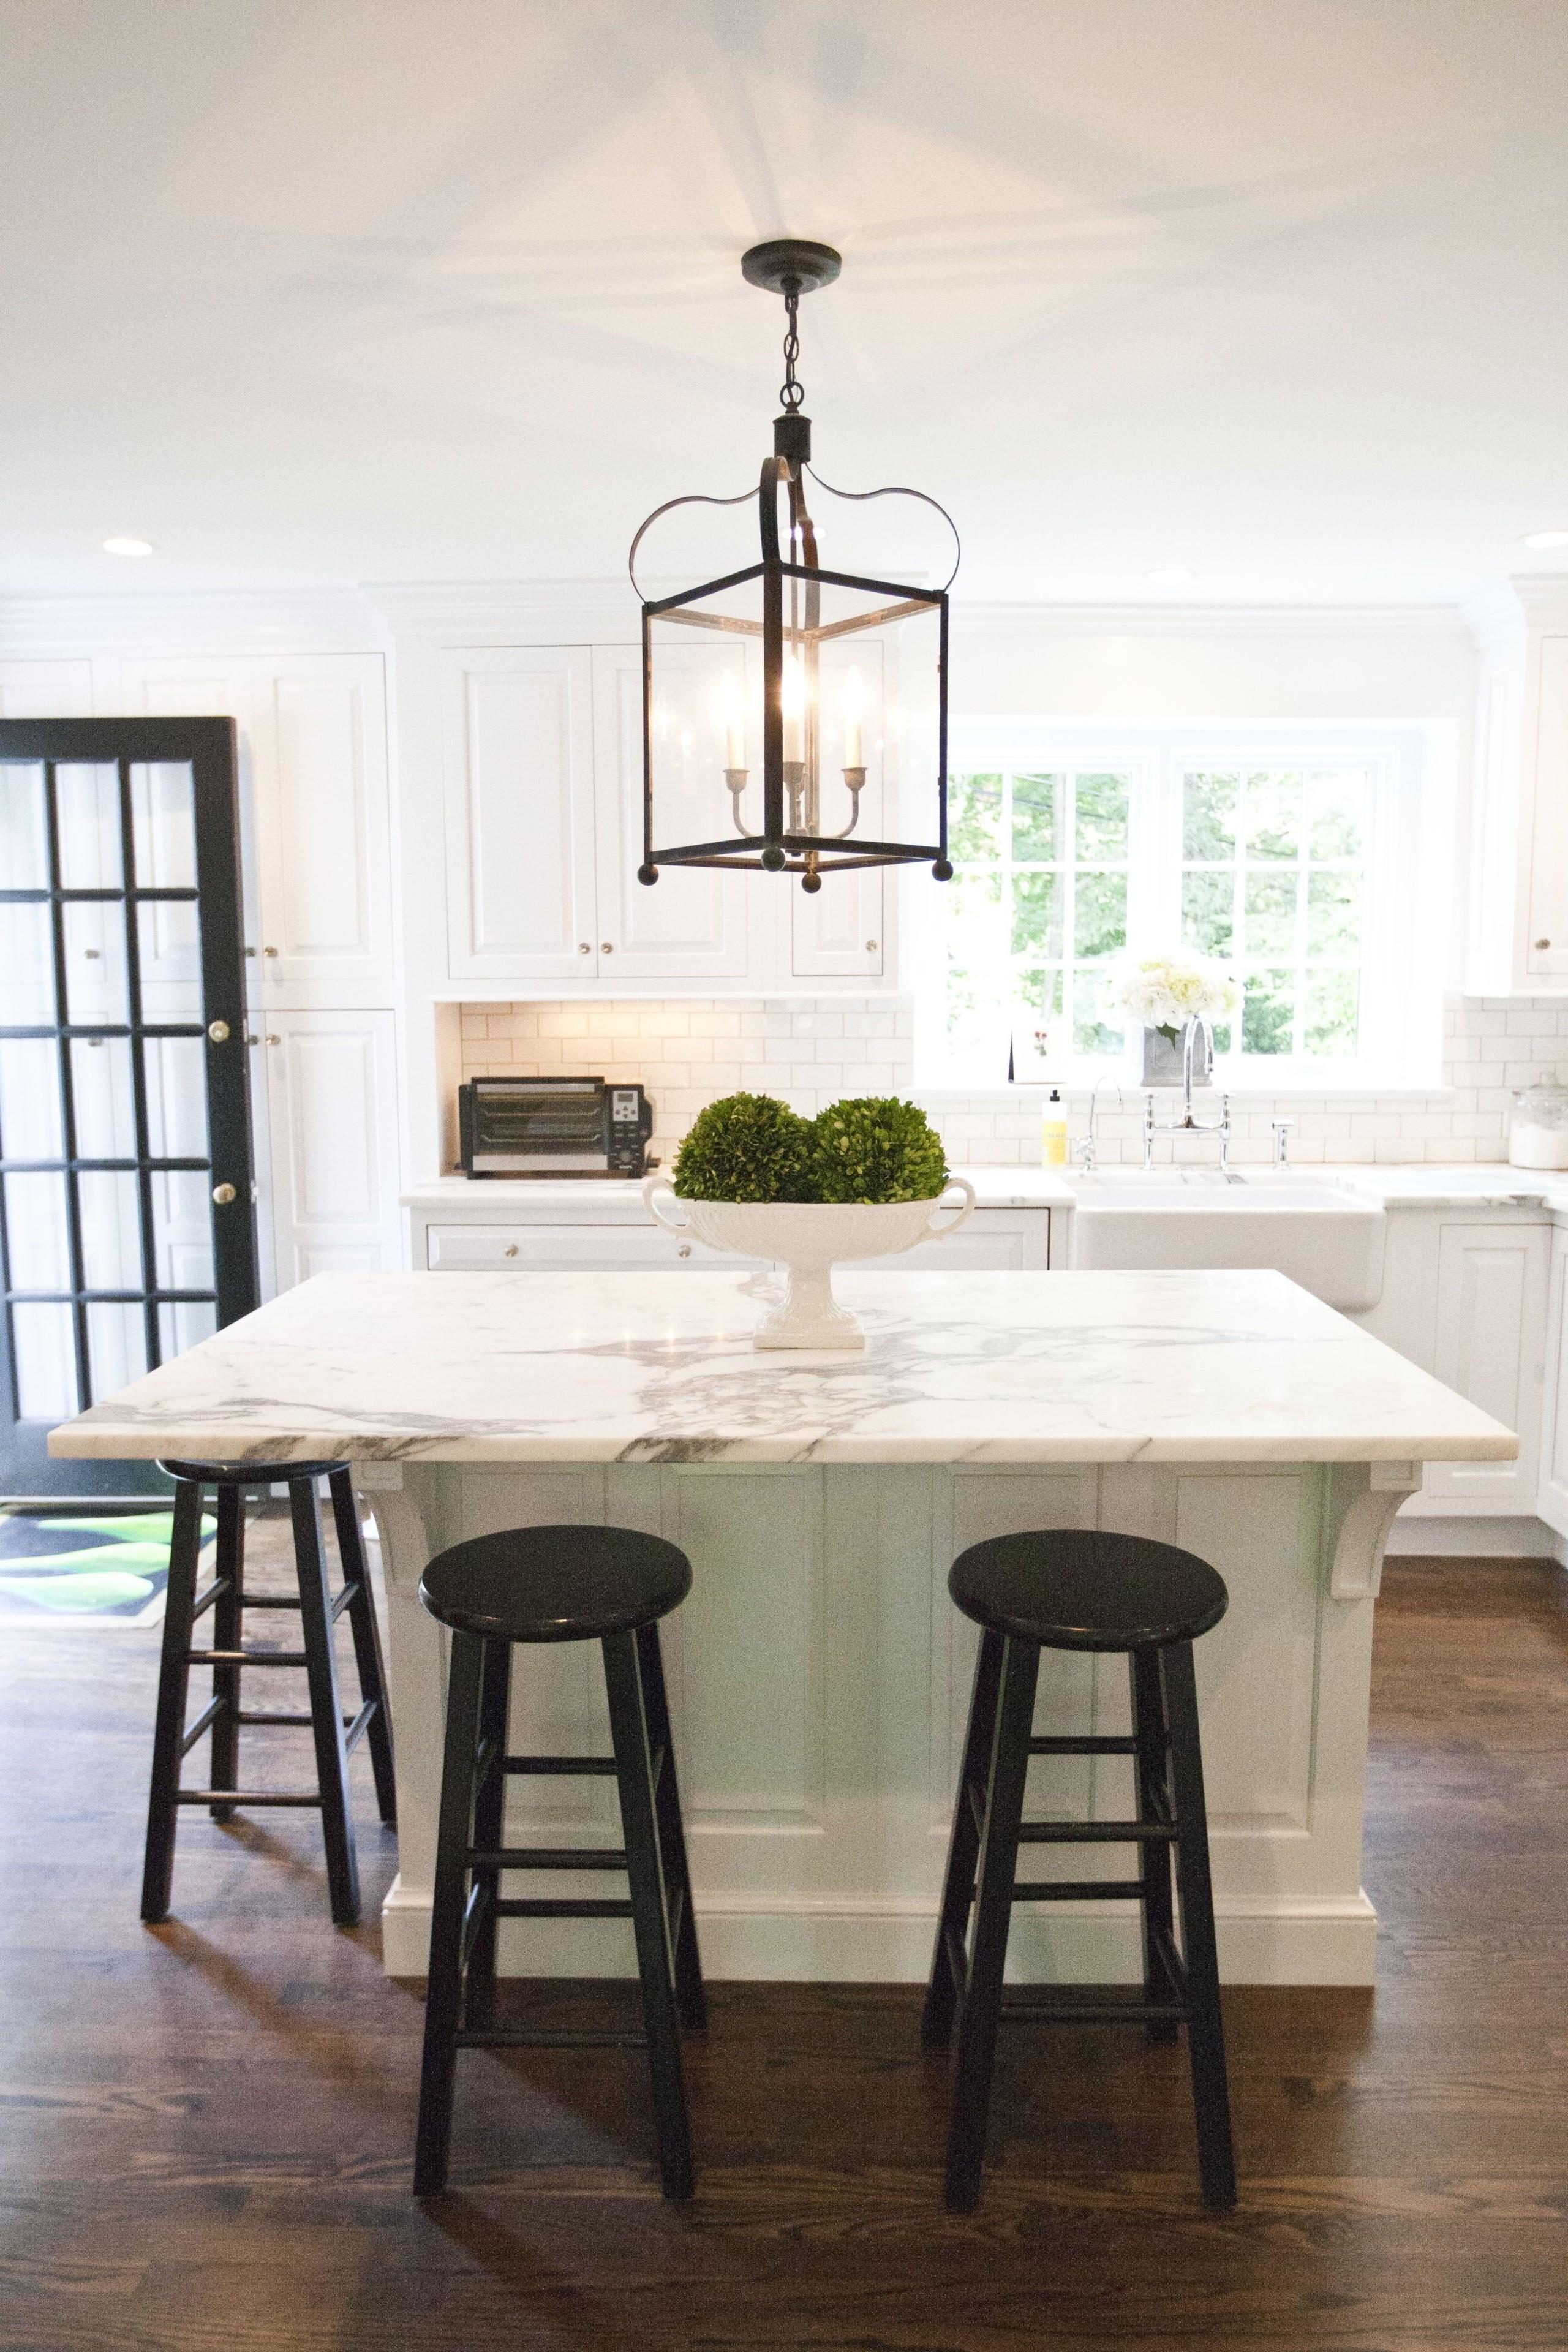 Attrayant Granite Kitchen Island With Seating